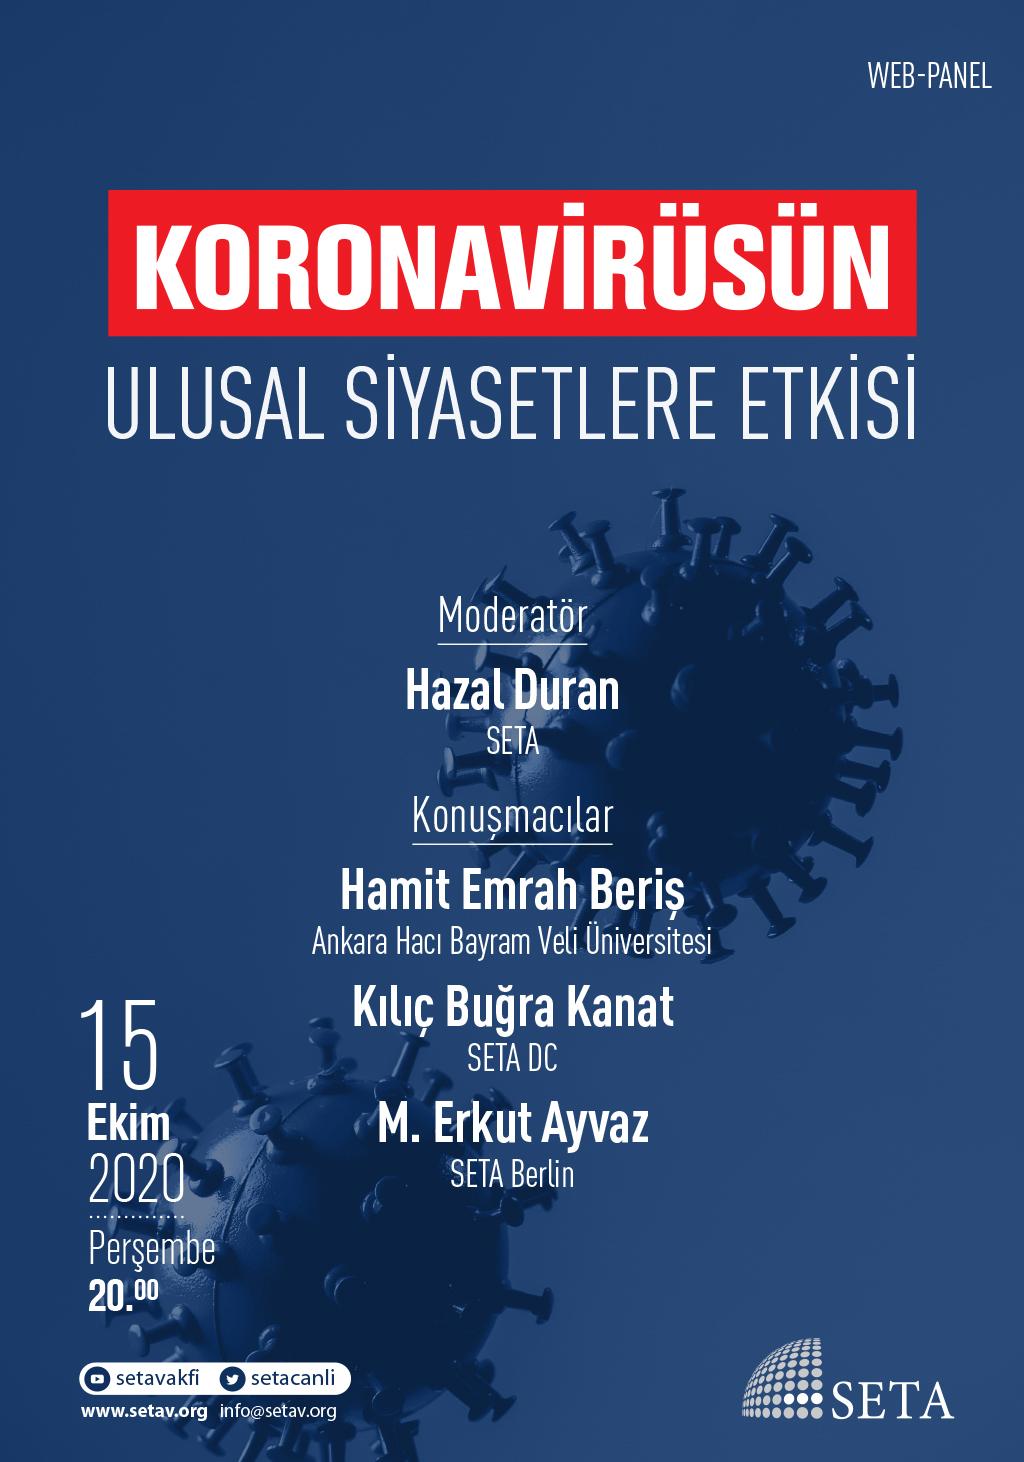 Web Panel: Koronavirüsün Ulusal Siyasetlere Etkisi